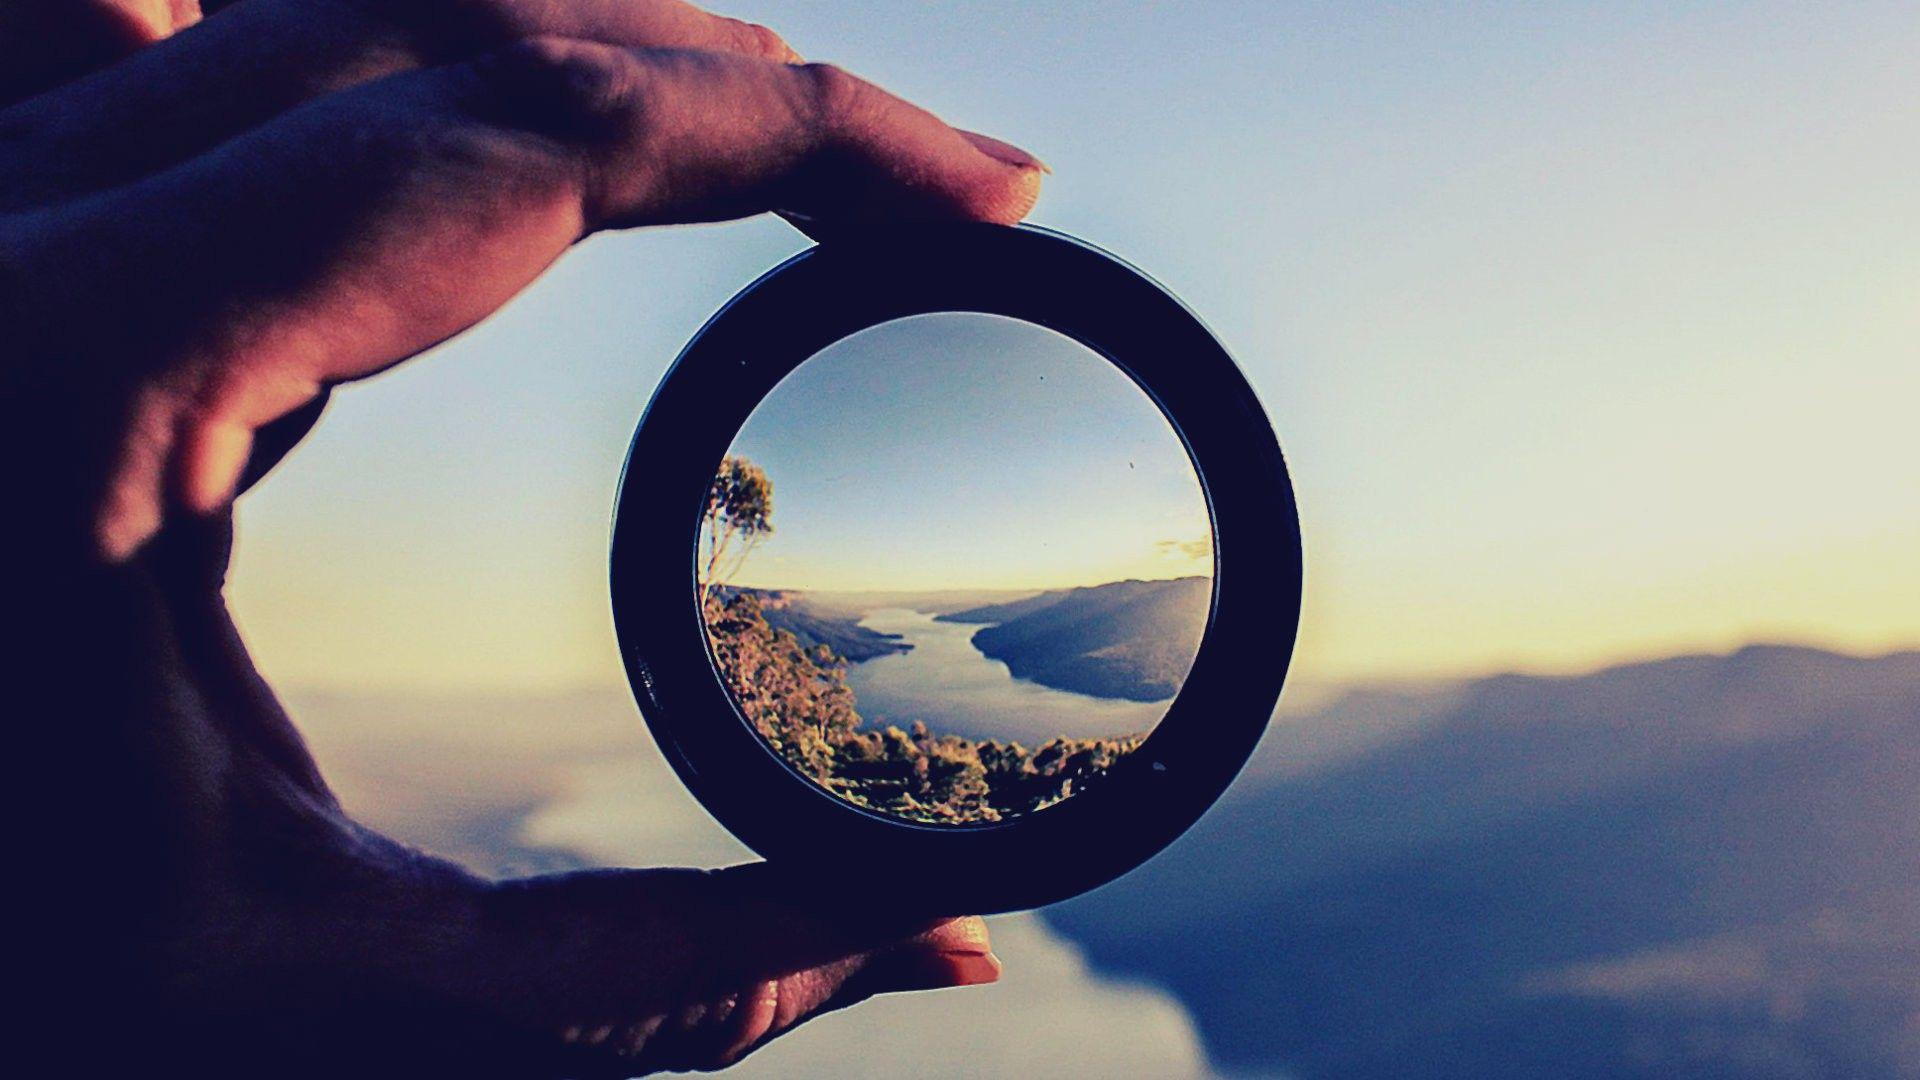 World Through Magnifying Glass Glass Magnifying World The - Artist creates art power sunlight magnifying glass